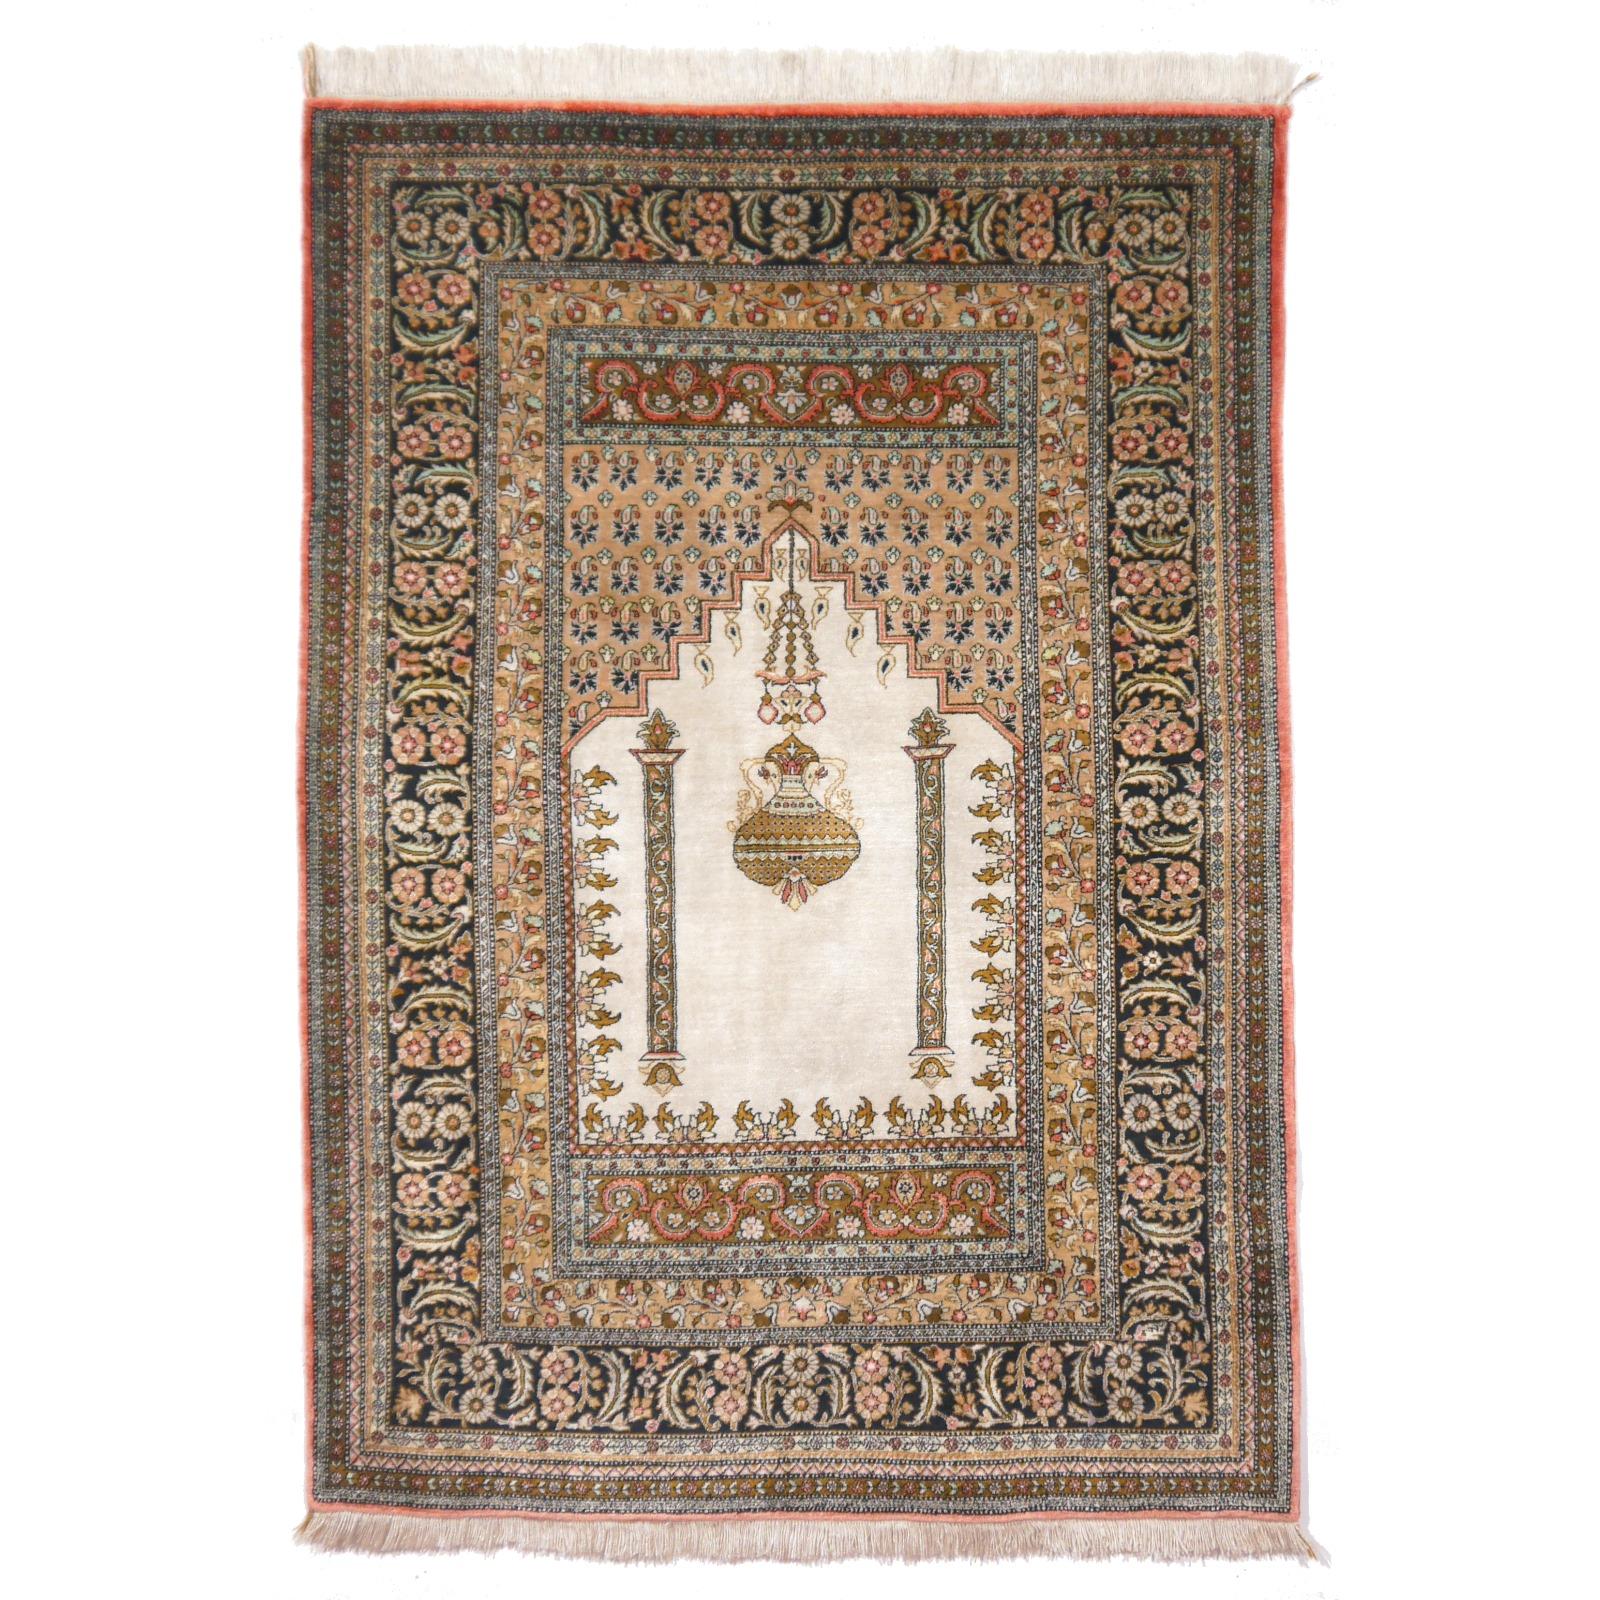 Seidenteppich  13187 Ghom Seide Teppich Iran / Persien 158 x 105 cm - Djoharian ...